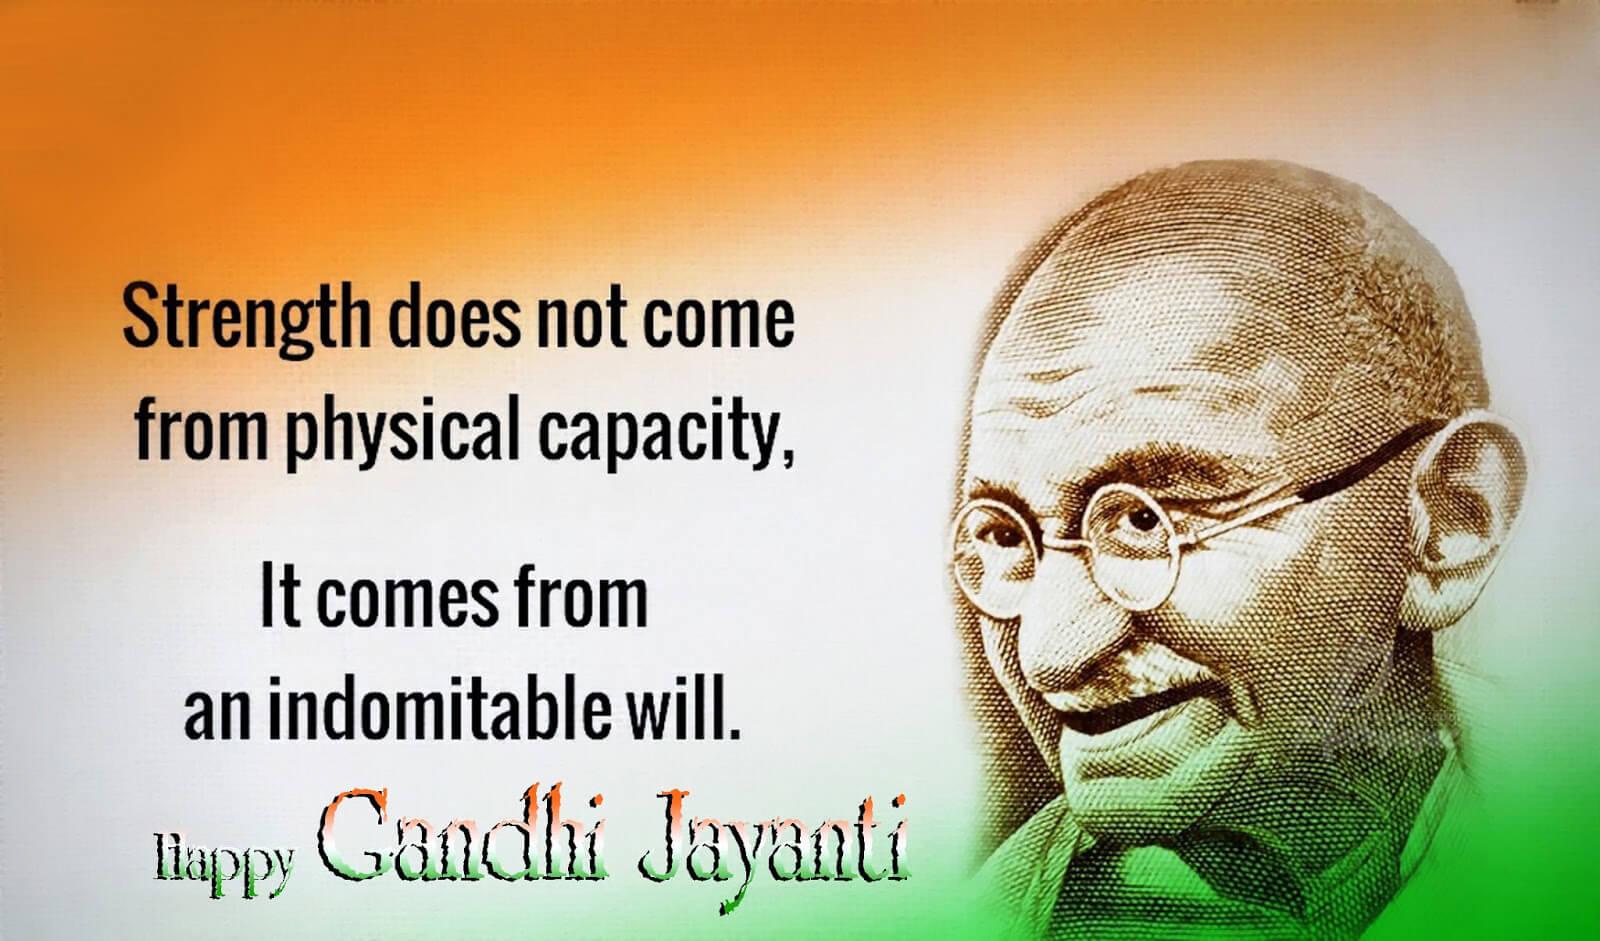 happy gandhi jayanti quotes wallpaper